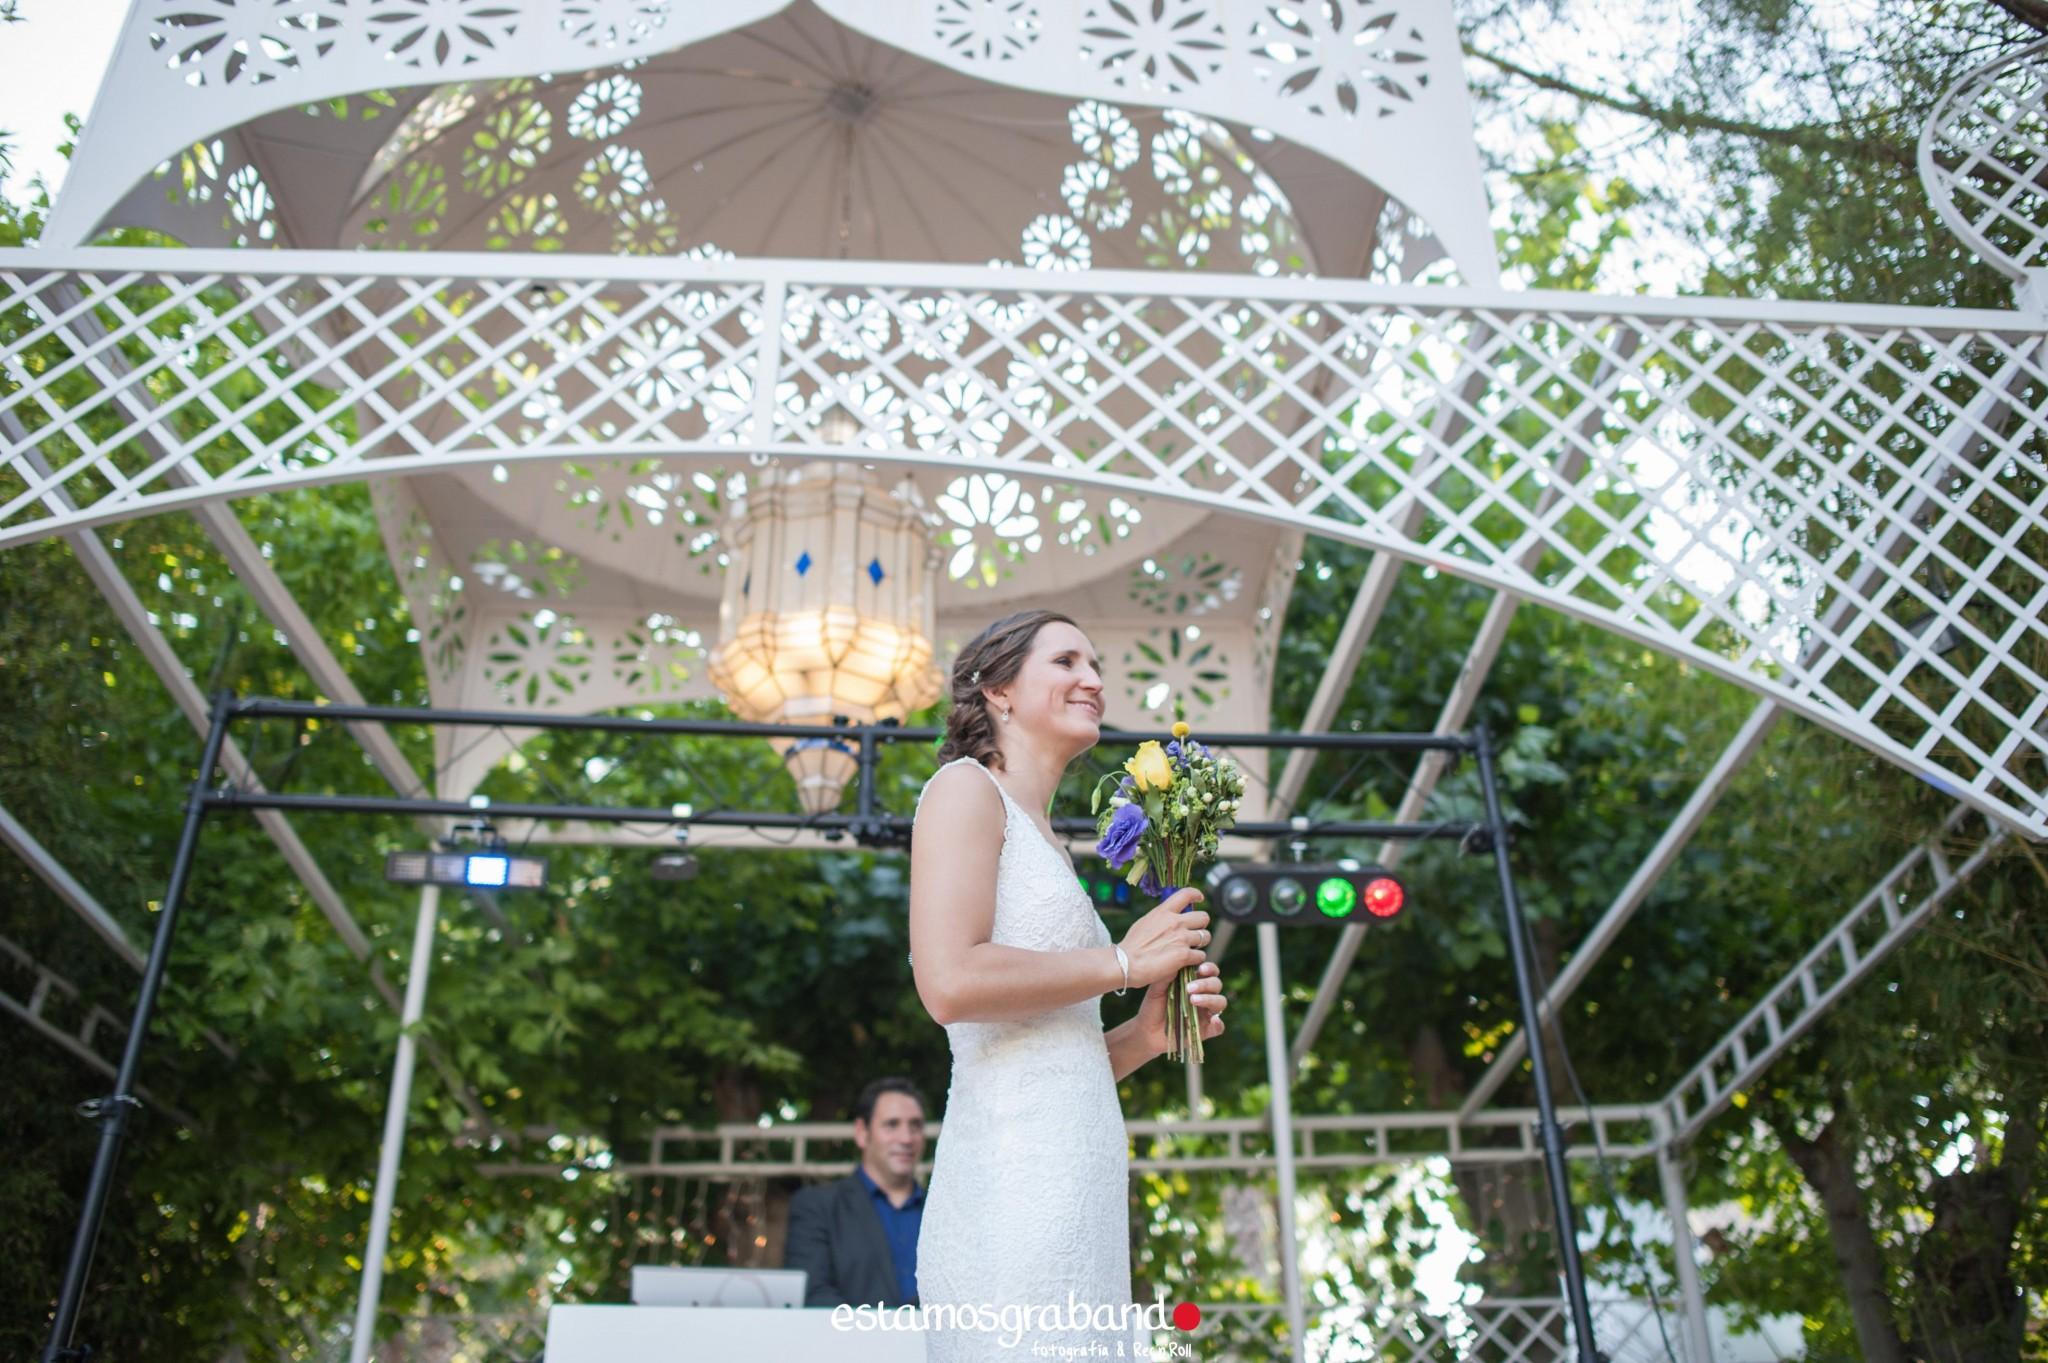 LEO-Y-PEDRO-78 Fotografía de Boda_Leo & Pedro [Jardines de la Mamunia, Granada] - video boda cadiz